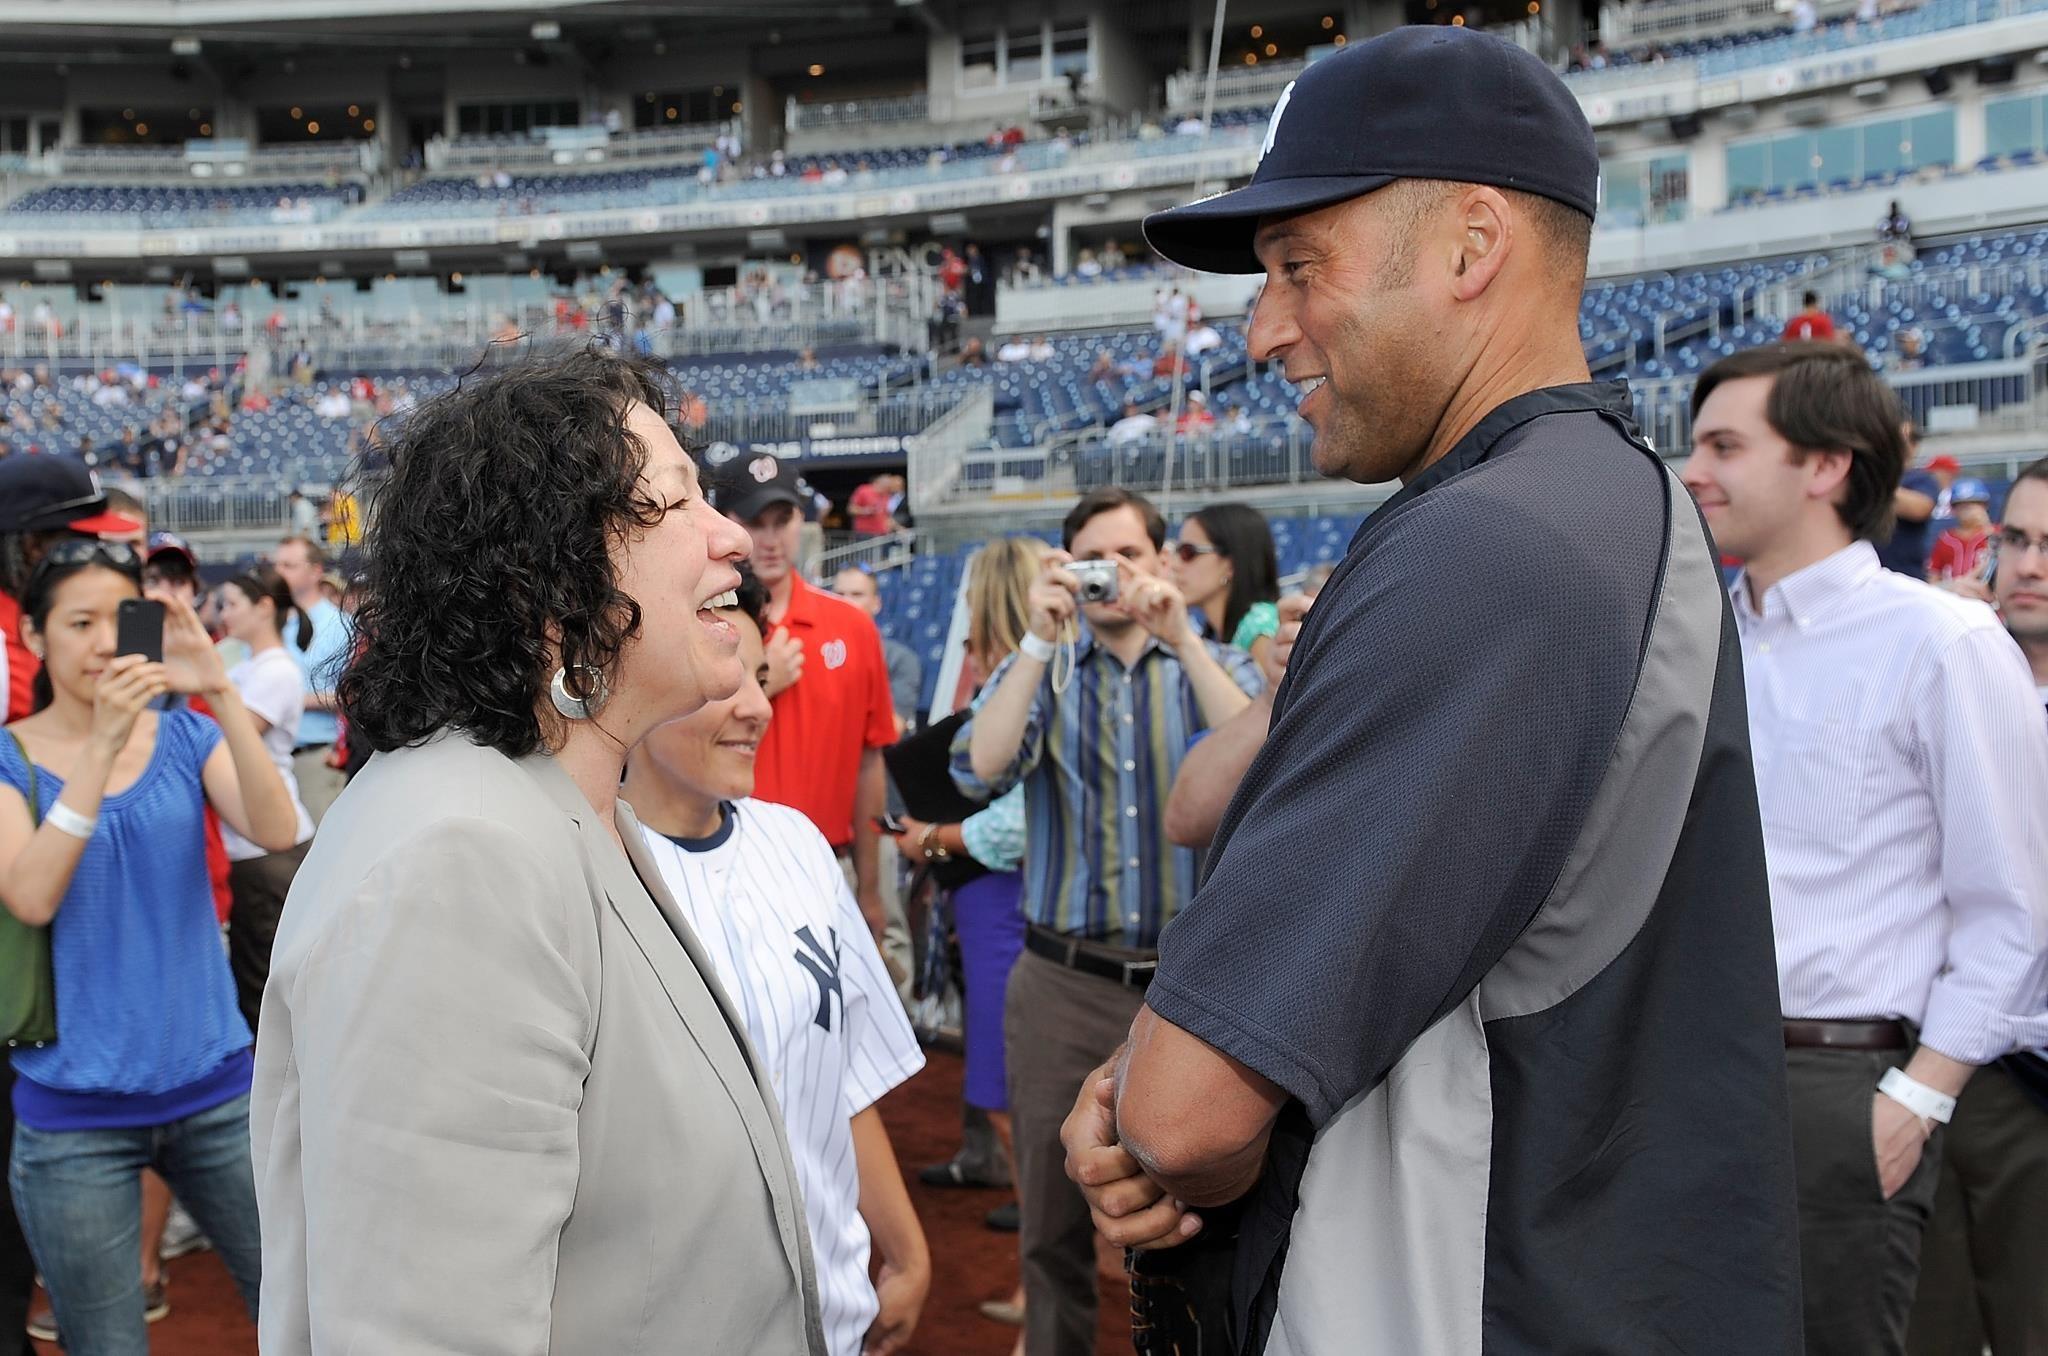 Sonia Sotomayor Justice United States Supreme Court And Derek Jeter Short Stop New York Yankees Bleachers Yankees New York Yankees